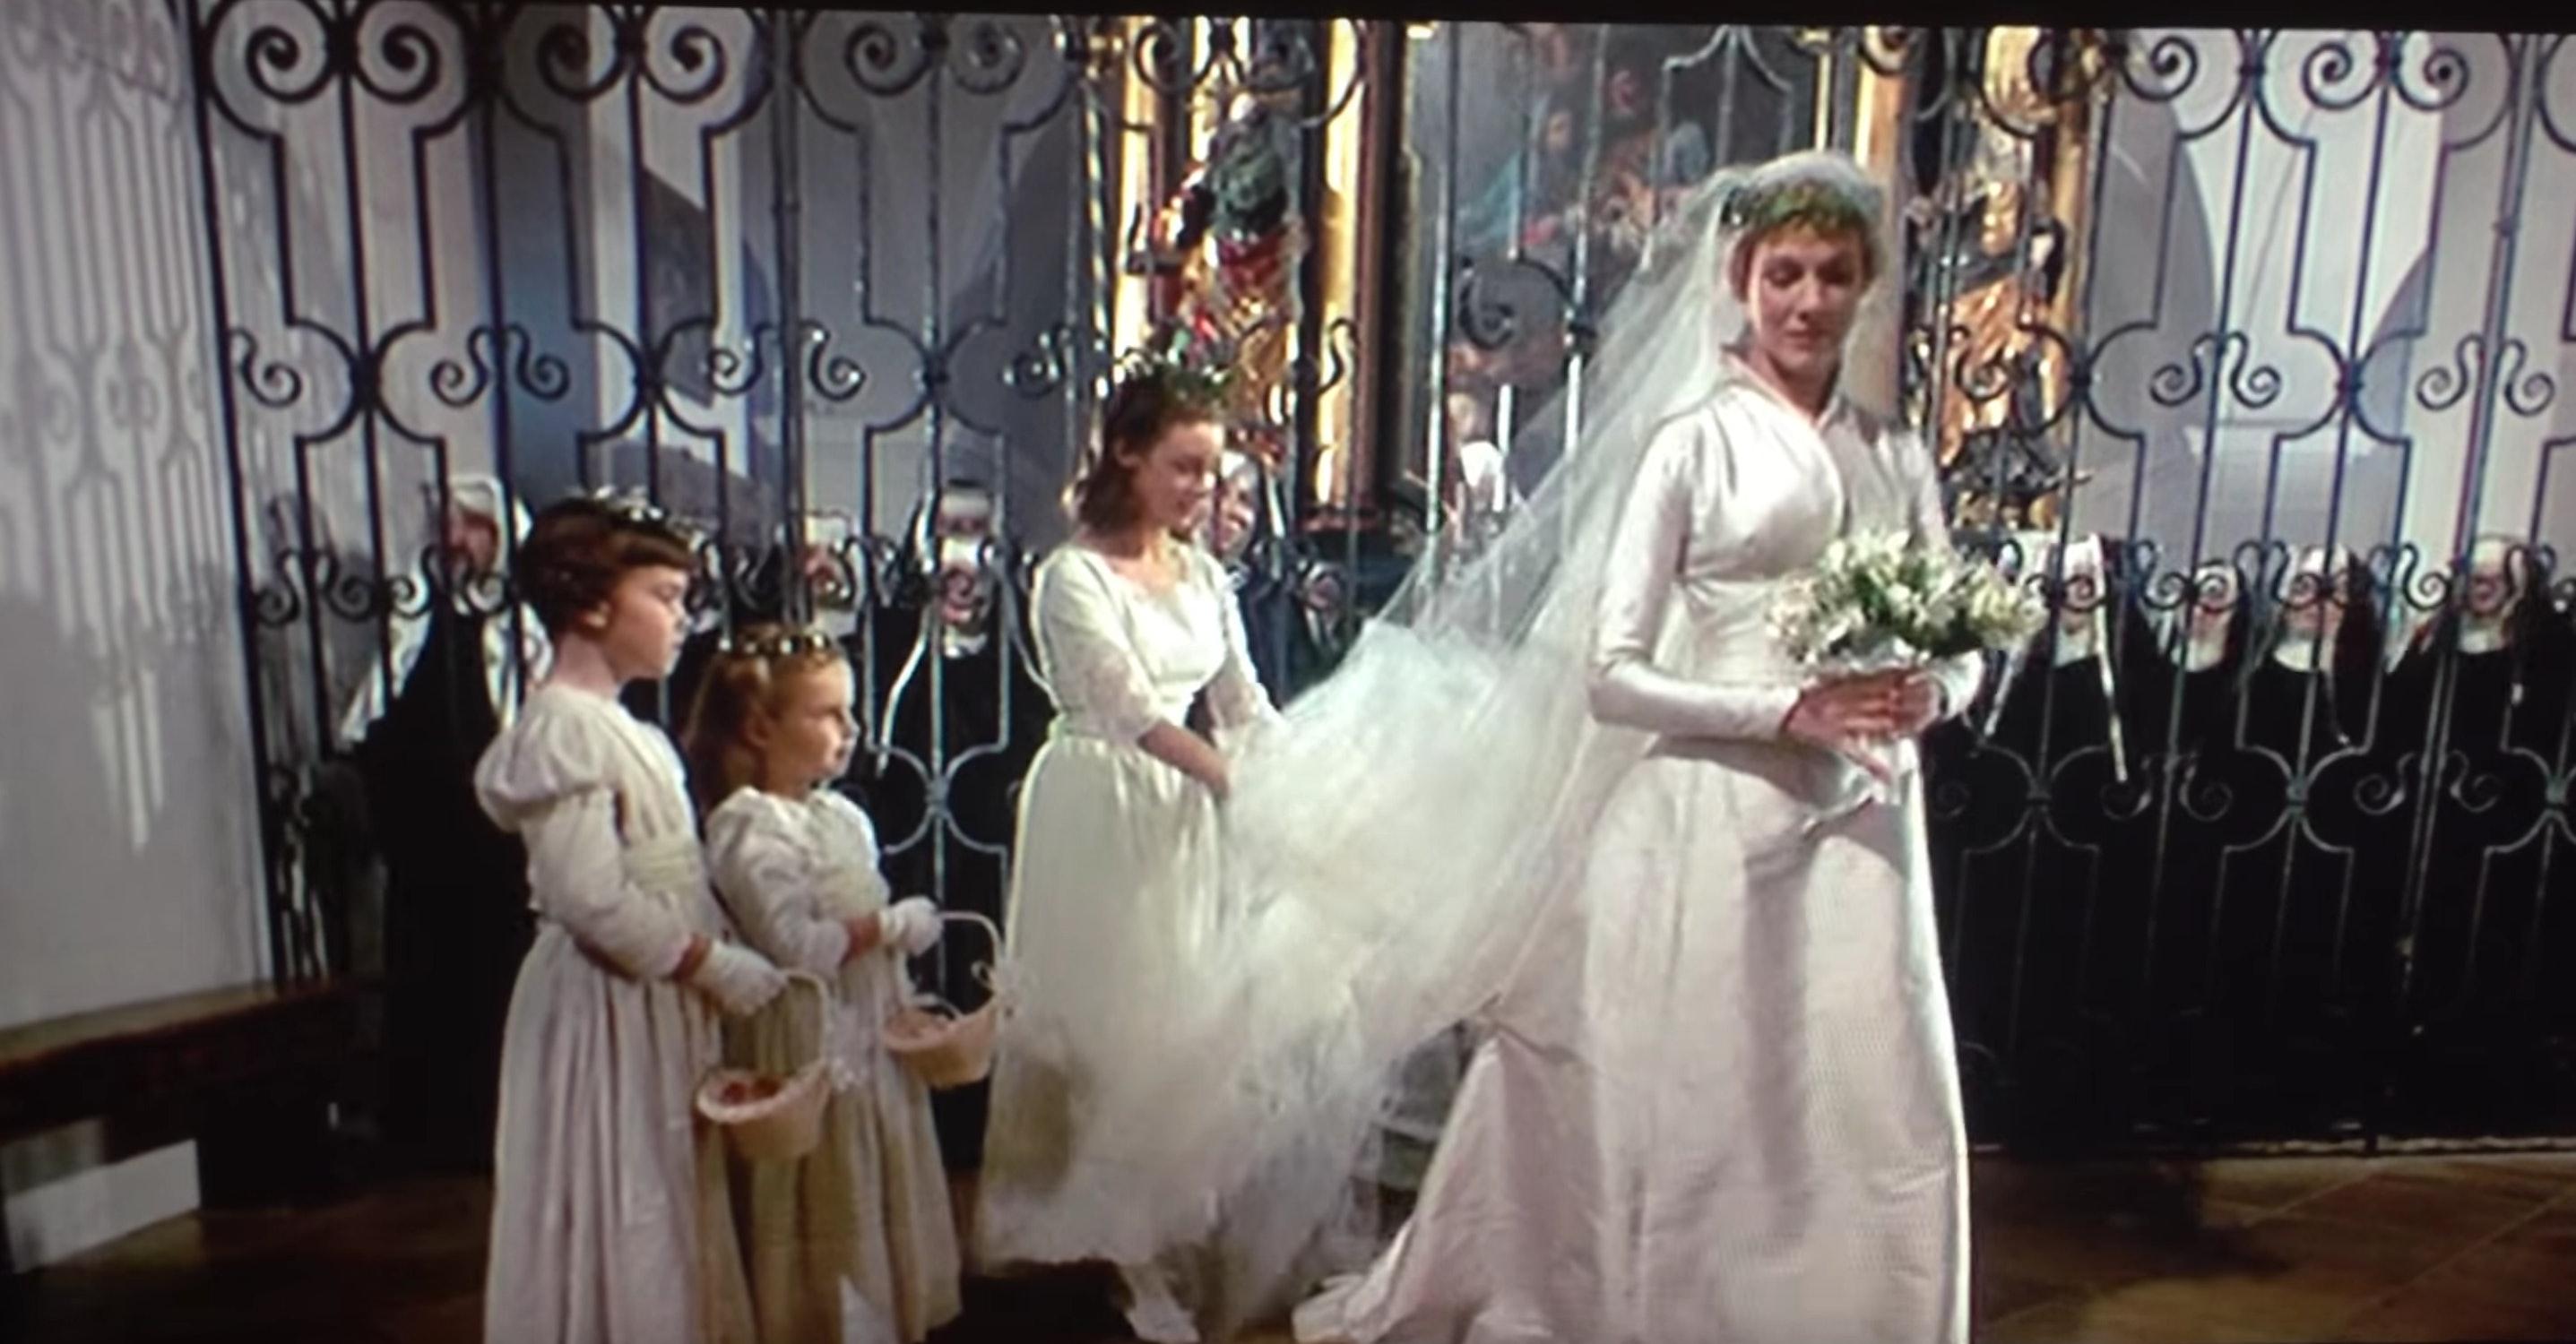 10 Unforgettable Wedding Dresses In Movies — PHOTOS